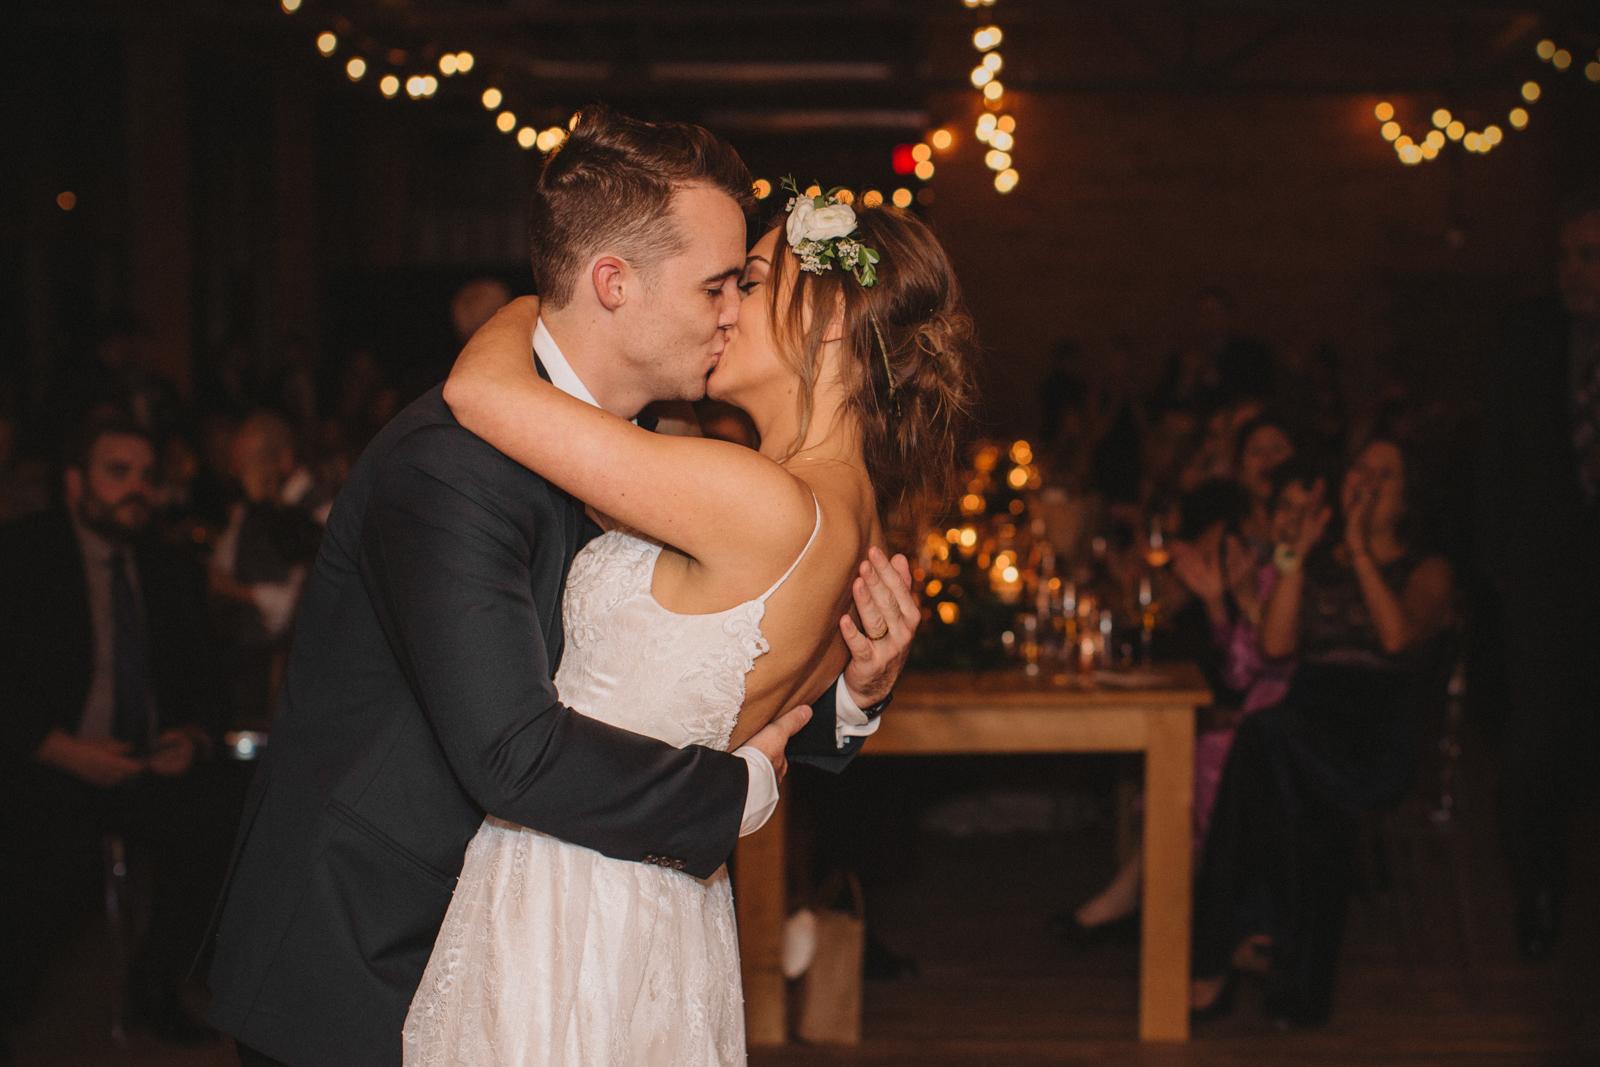 BeanandCole.com-Chris&JackieJohnson-Wedding-285.jpg